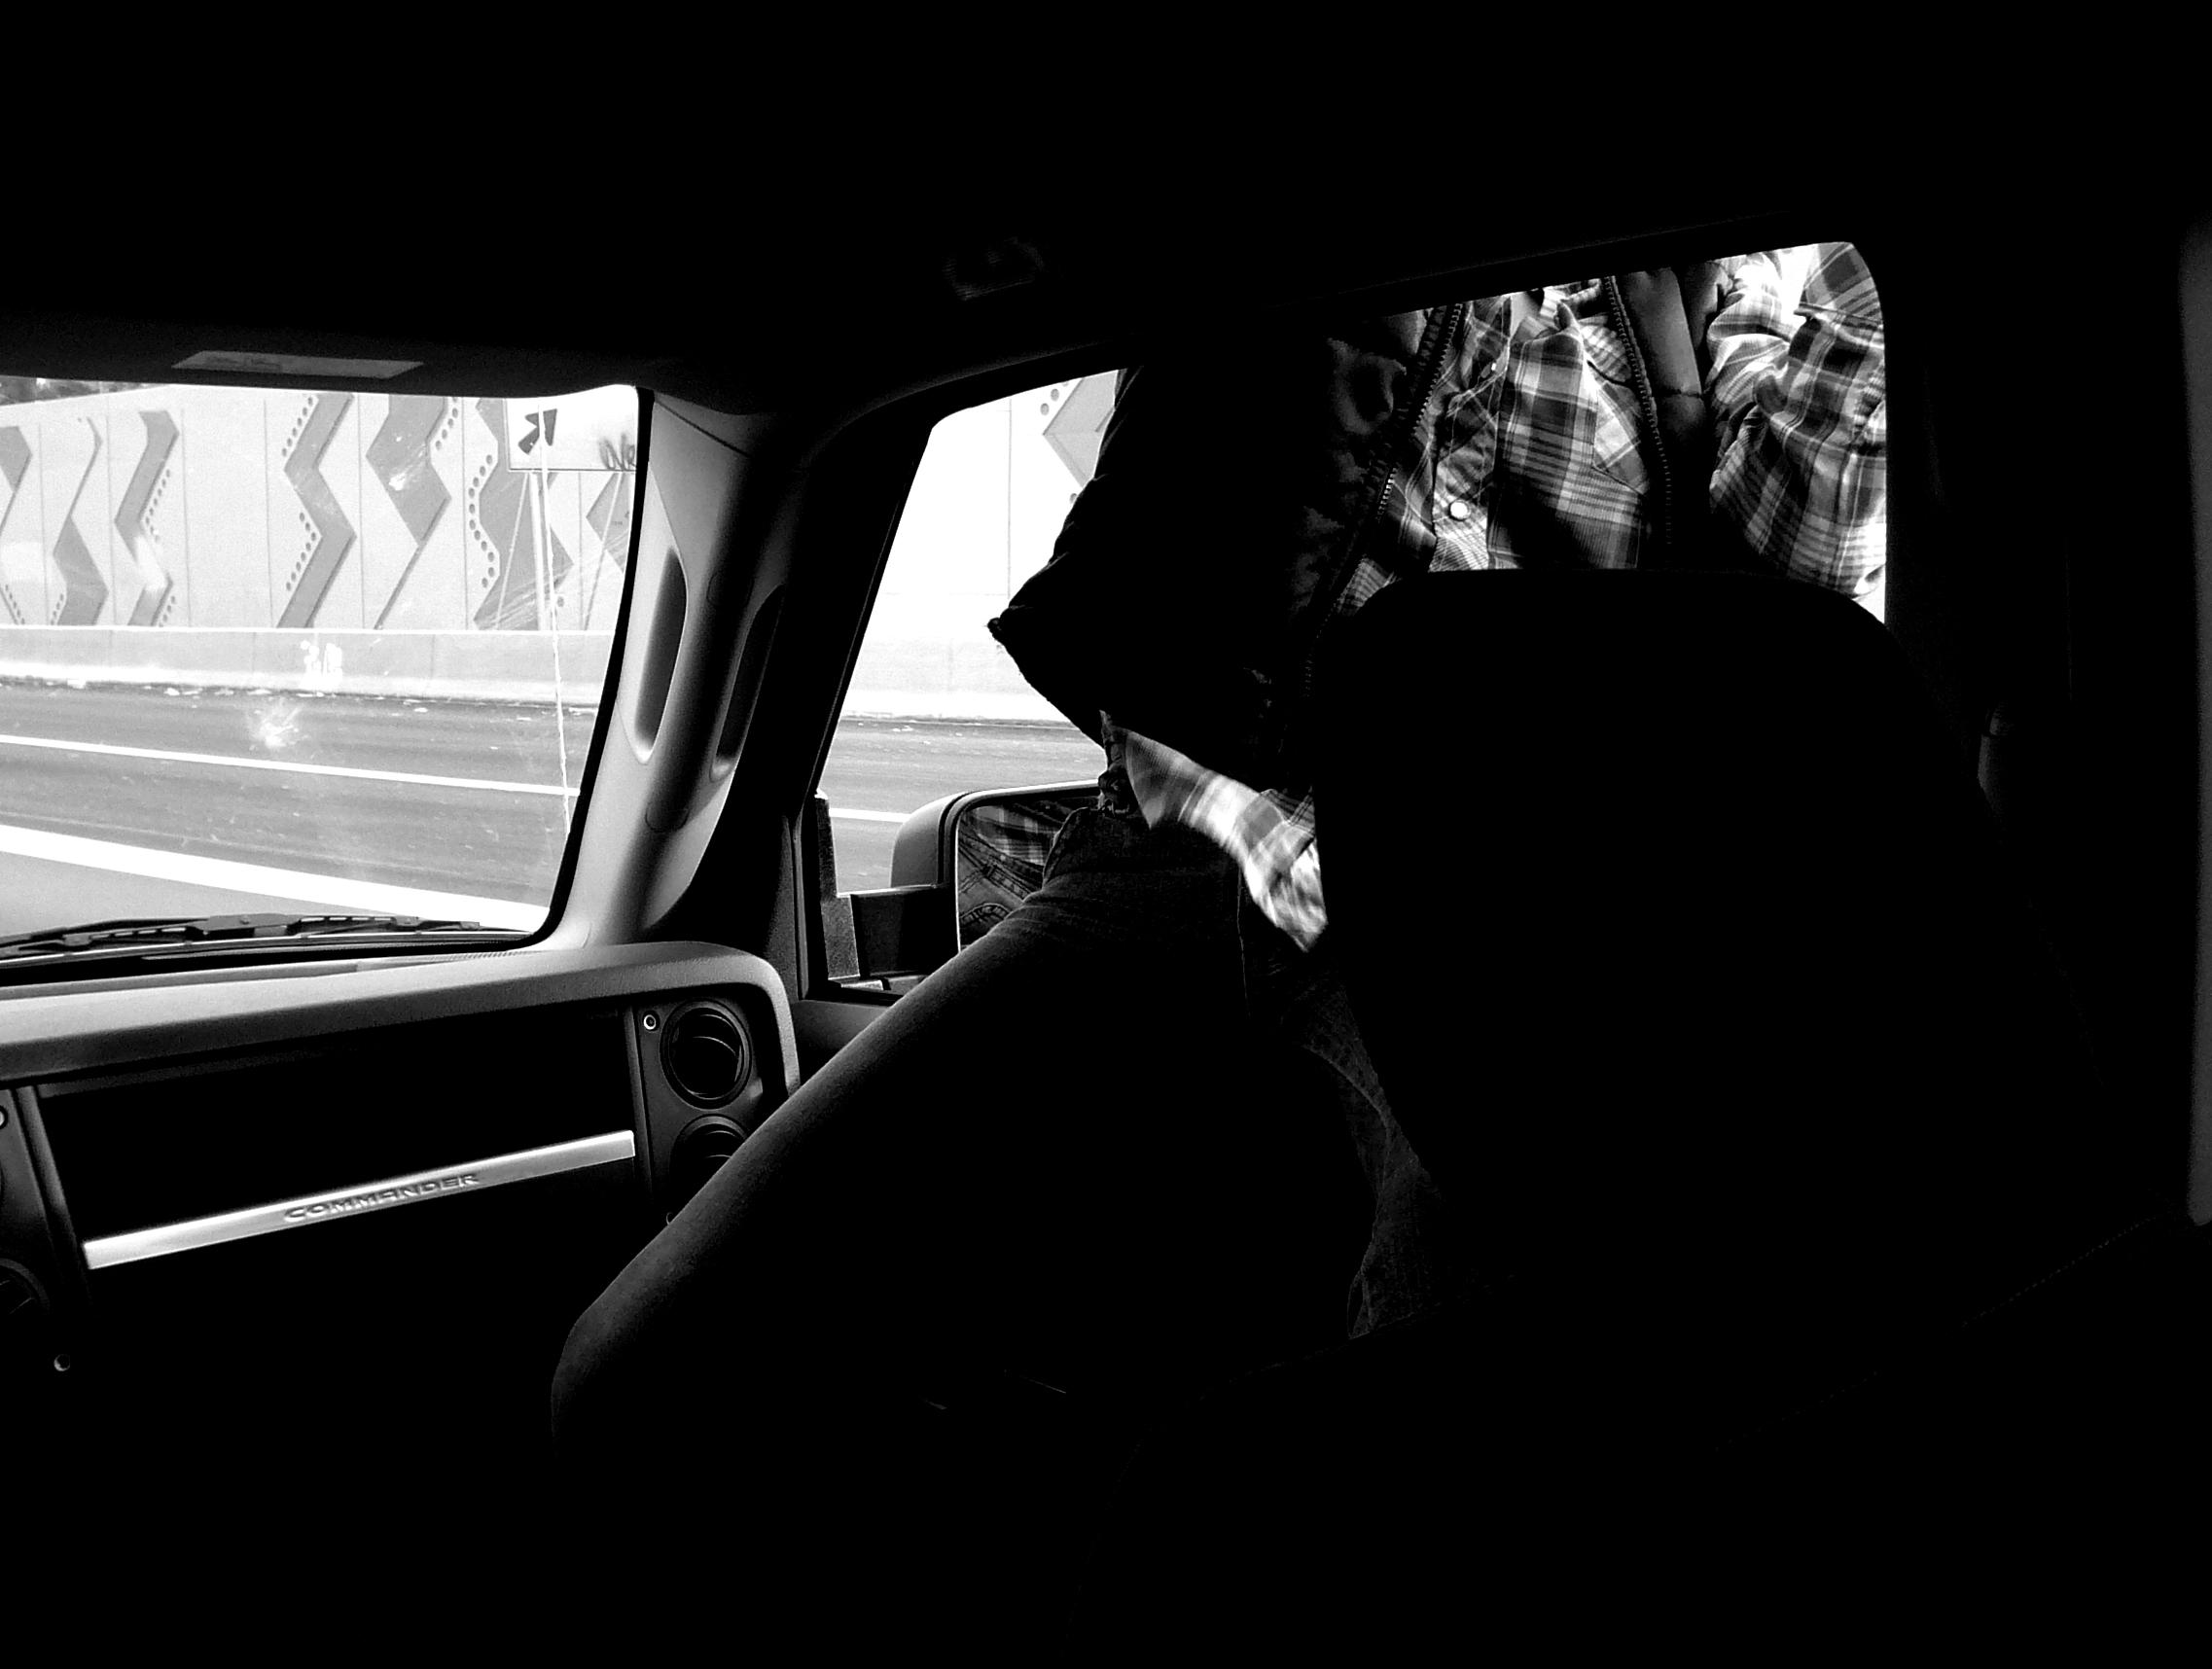 window1_2